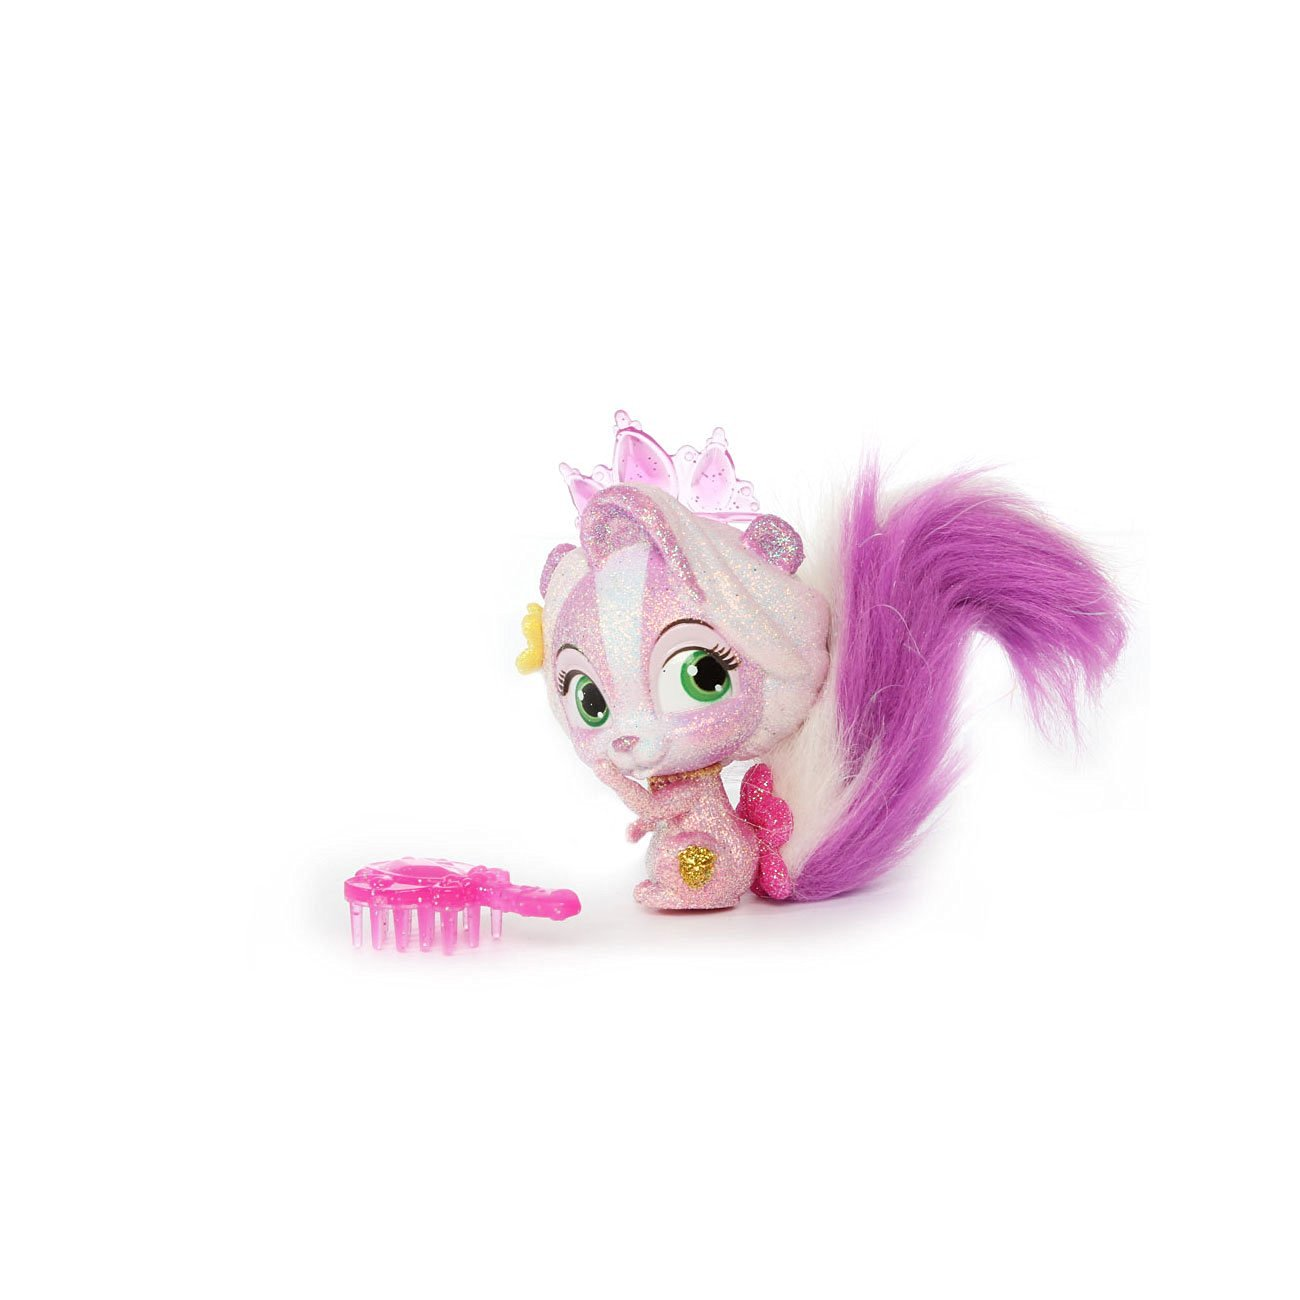 Disney Princess Palace Pets - Glitzy Glitter Friends - Rapunzel's Skunk, Meadow